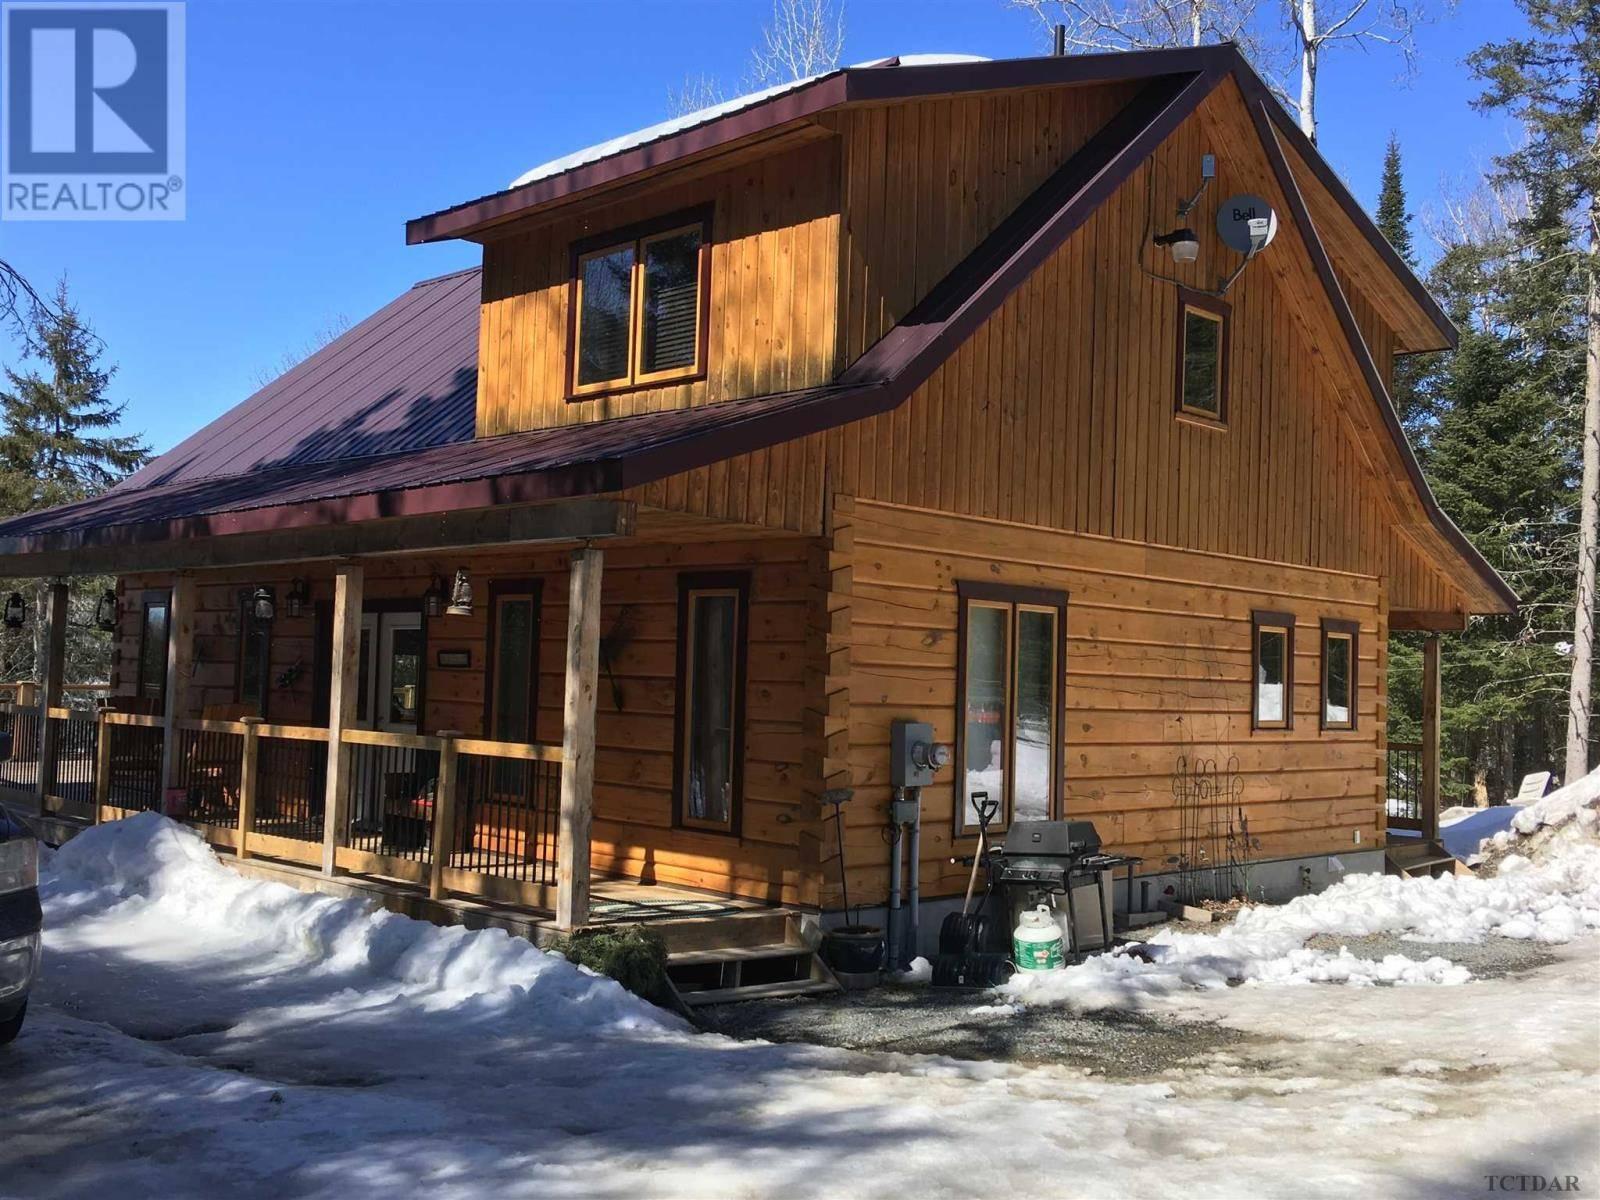 House for sale at 236407 Wendigo Lake Rd Englehart Ontario - MLS: TM192606